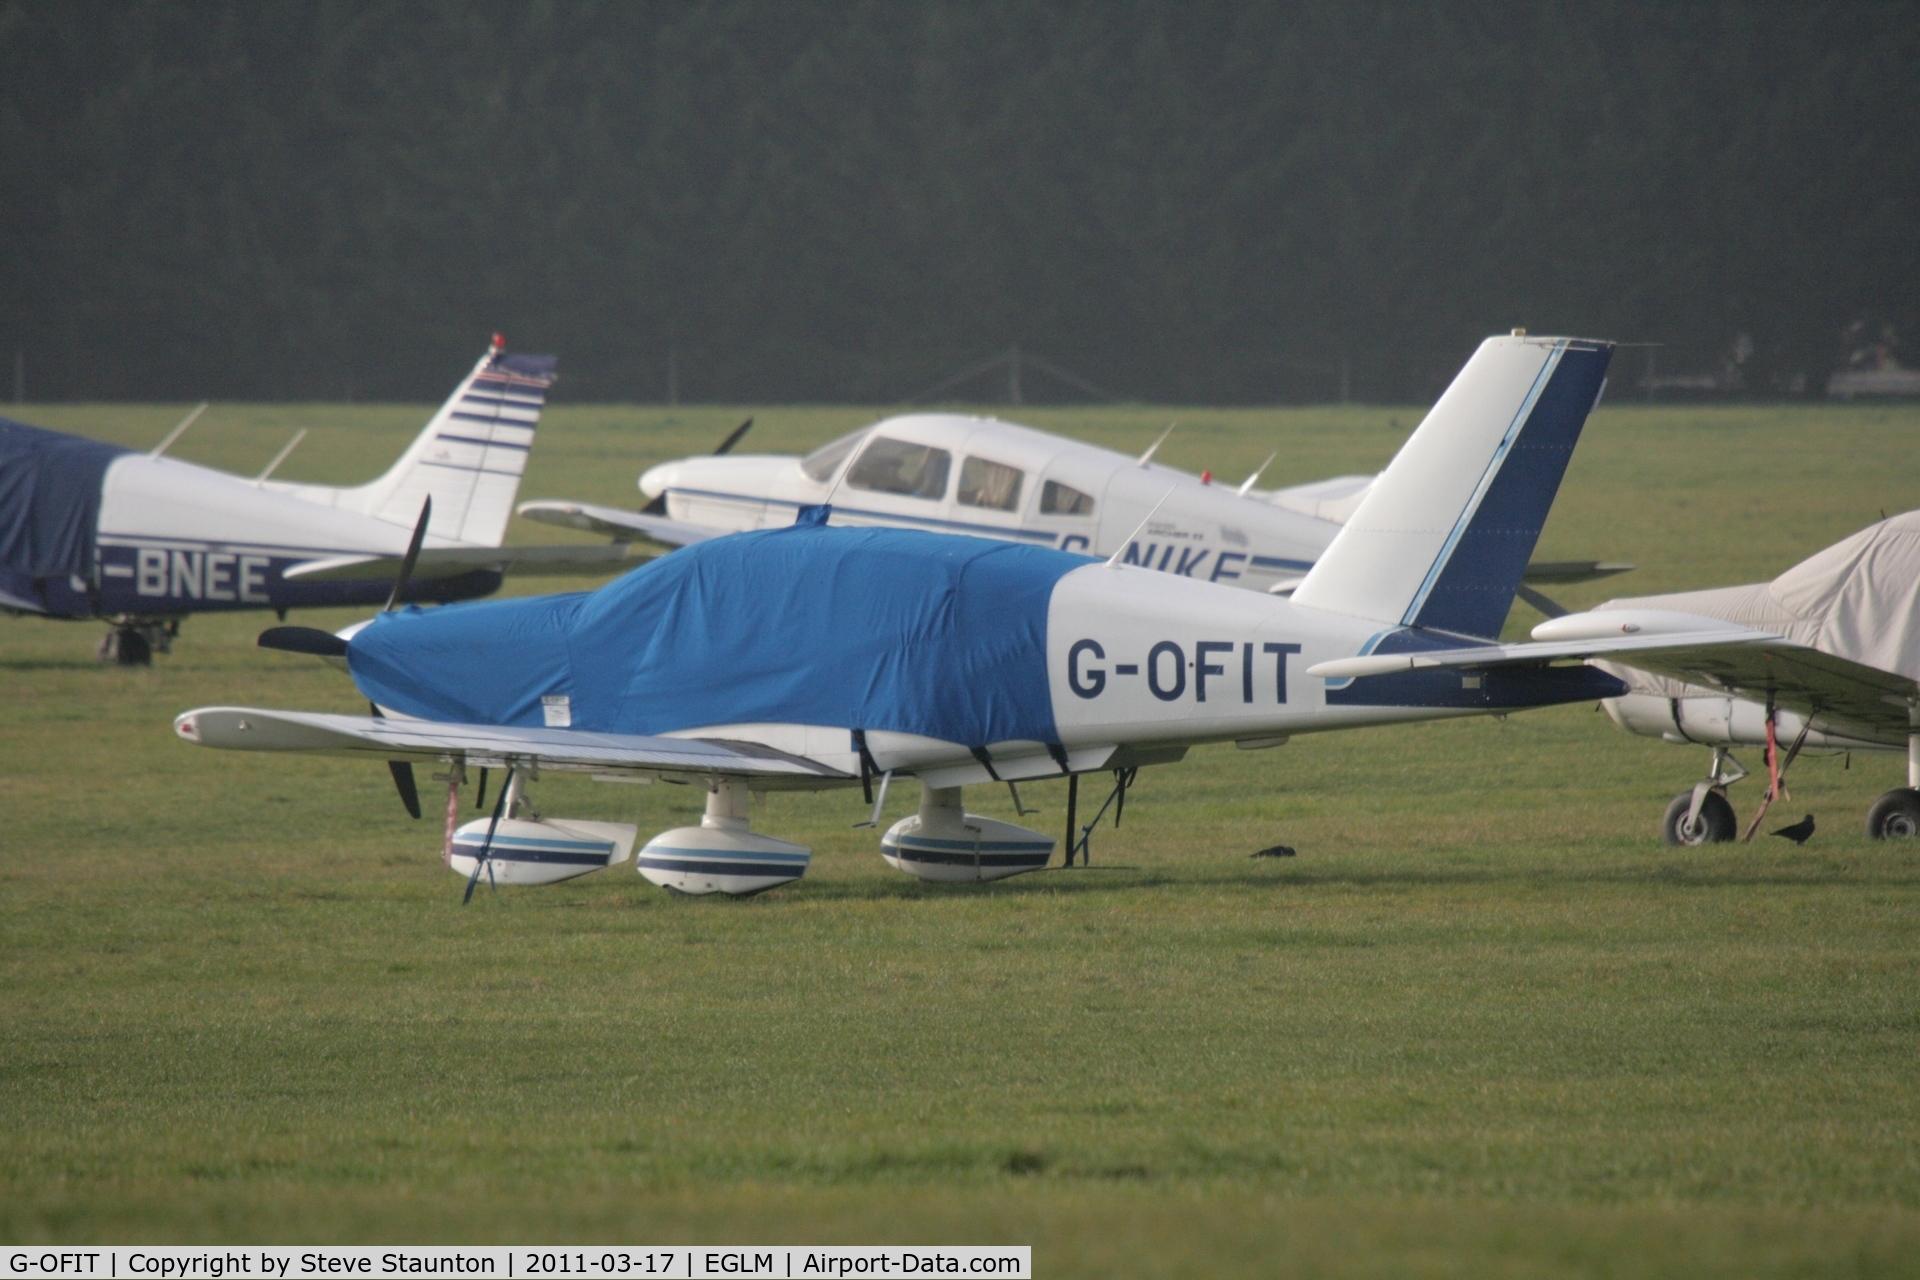 G-OFIT, 1989 Socata TB-10 Tobago C/N 938, Taken at White Waltham Airfield March 2011